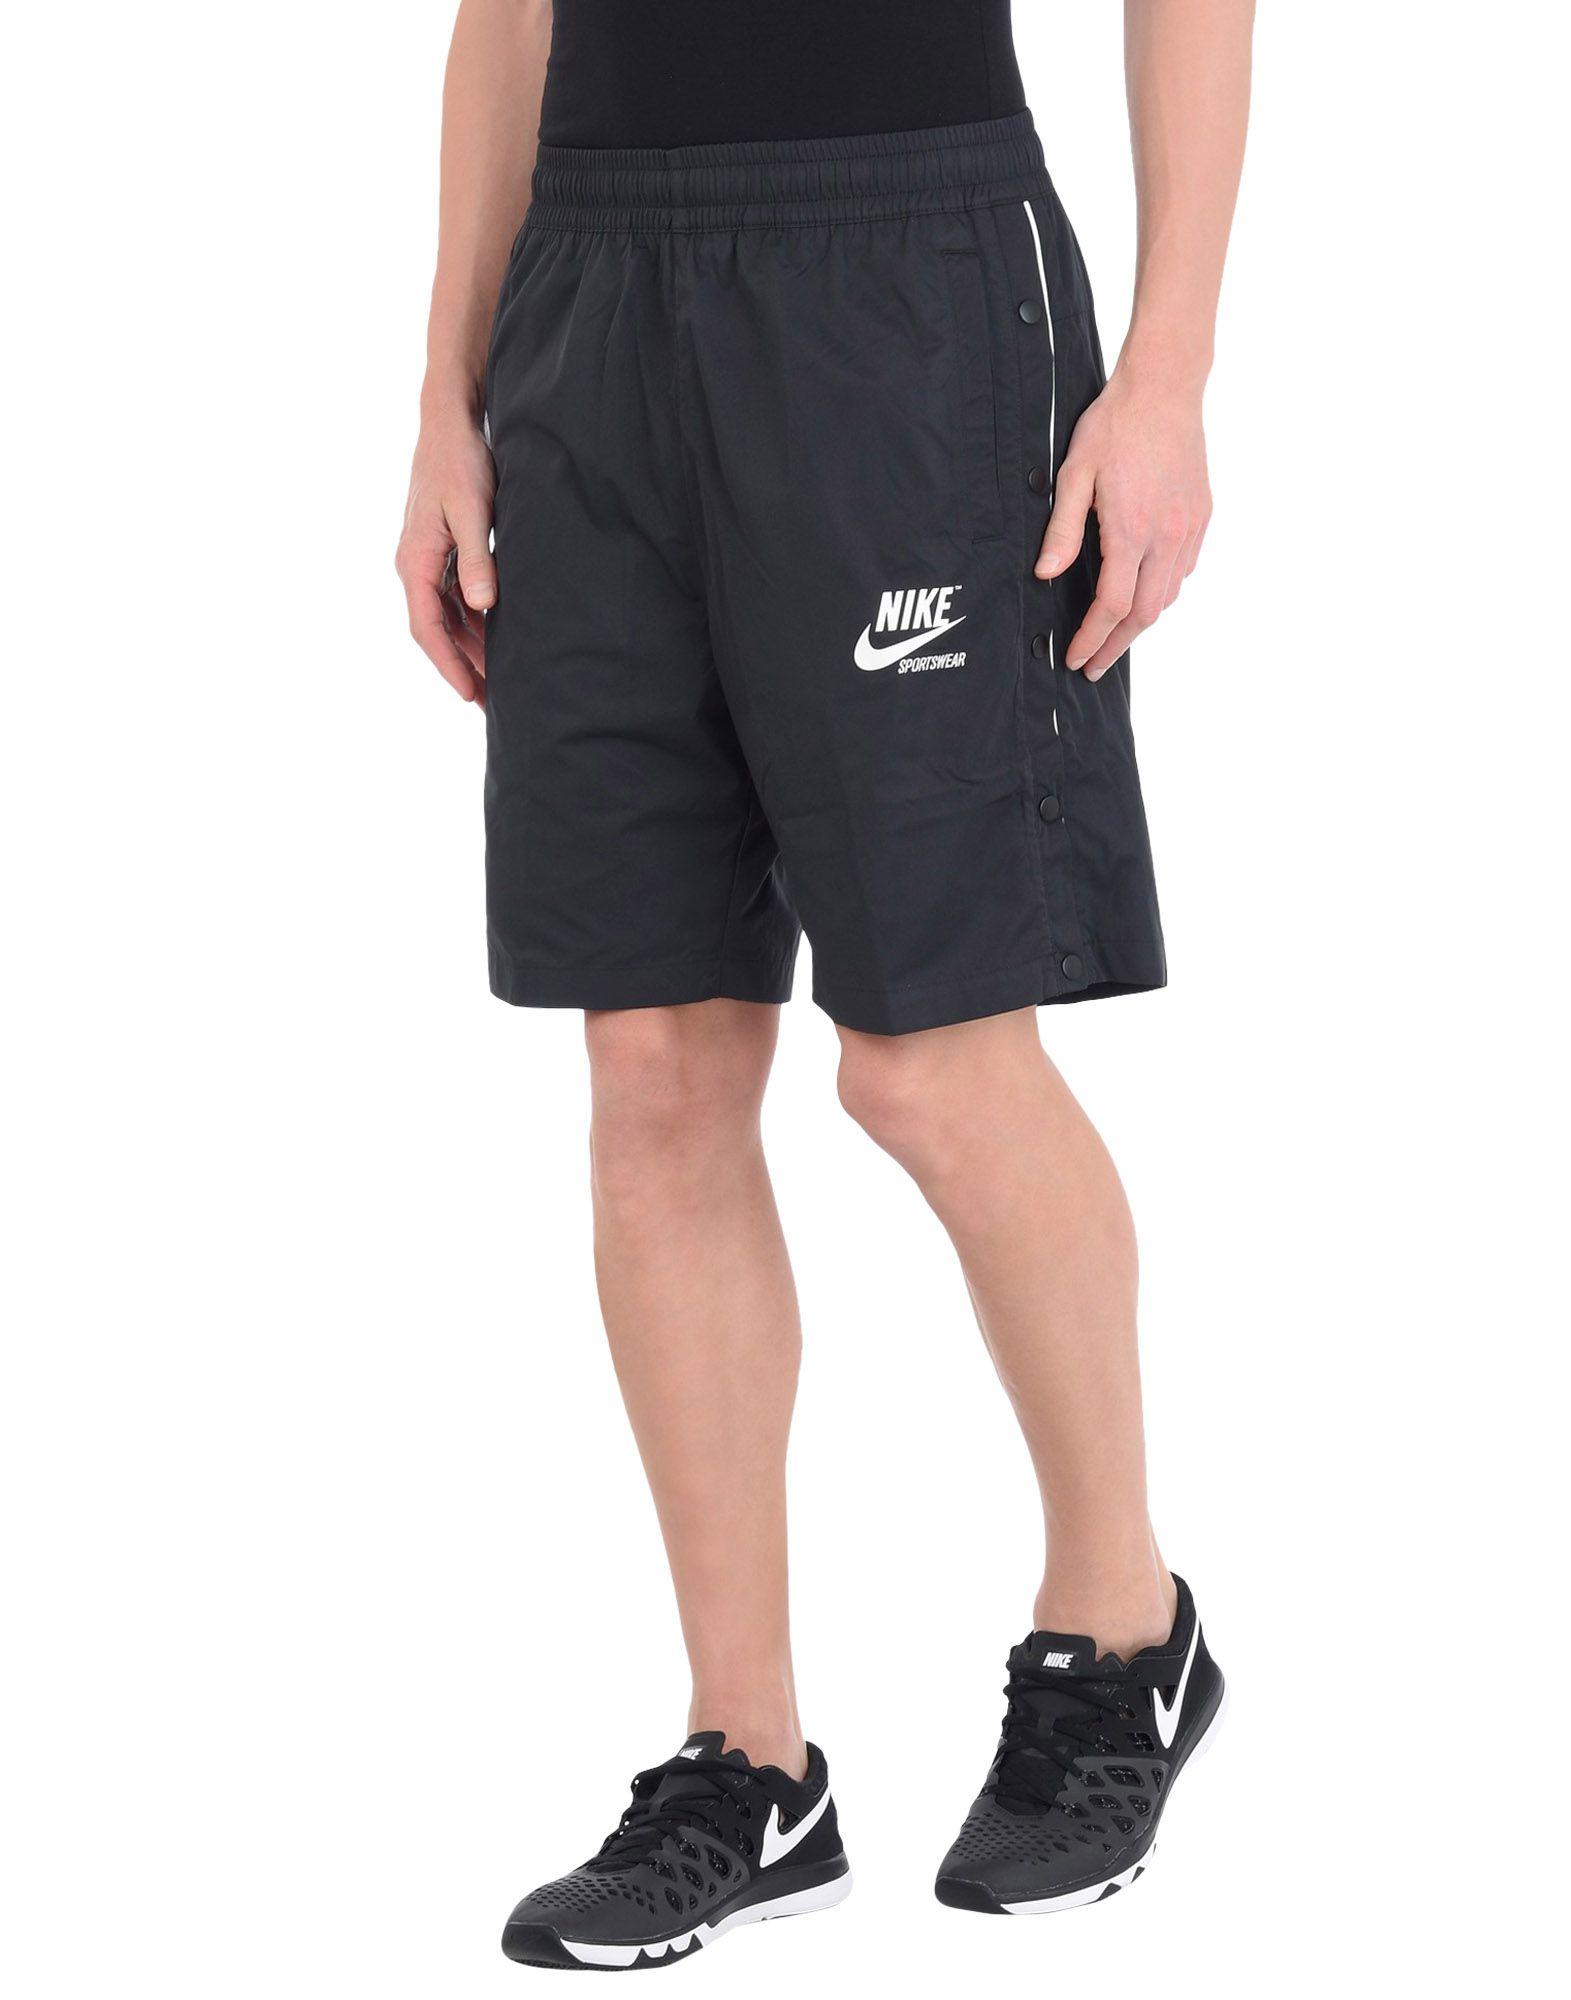 Pantalone Sportivo Nike Short Woven Ar ve - - - uomo - 13190931HN 4f5